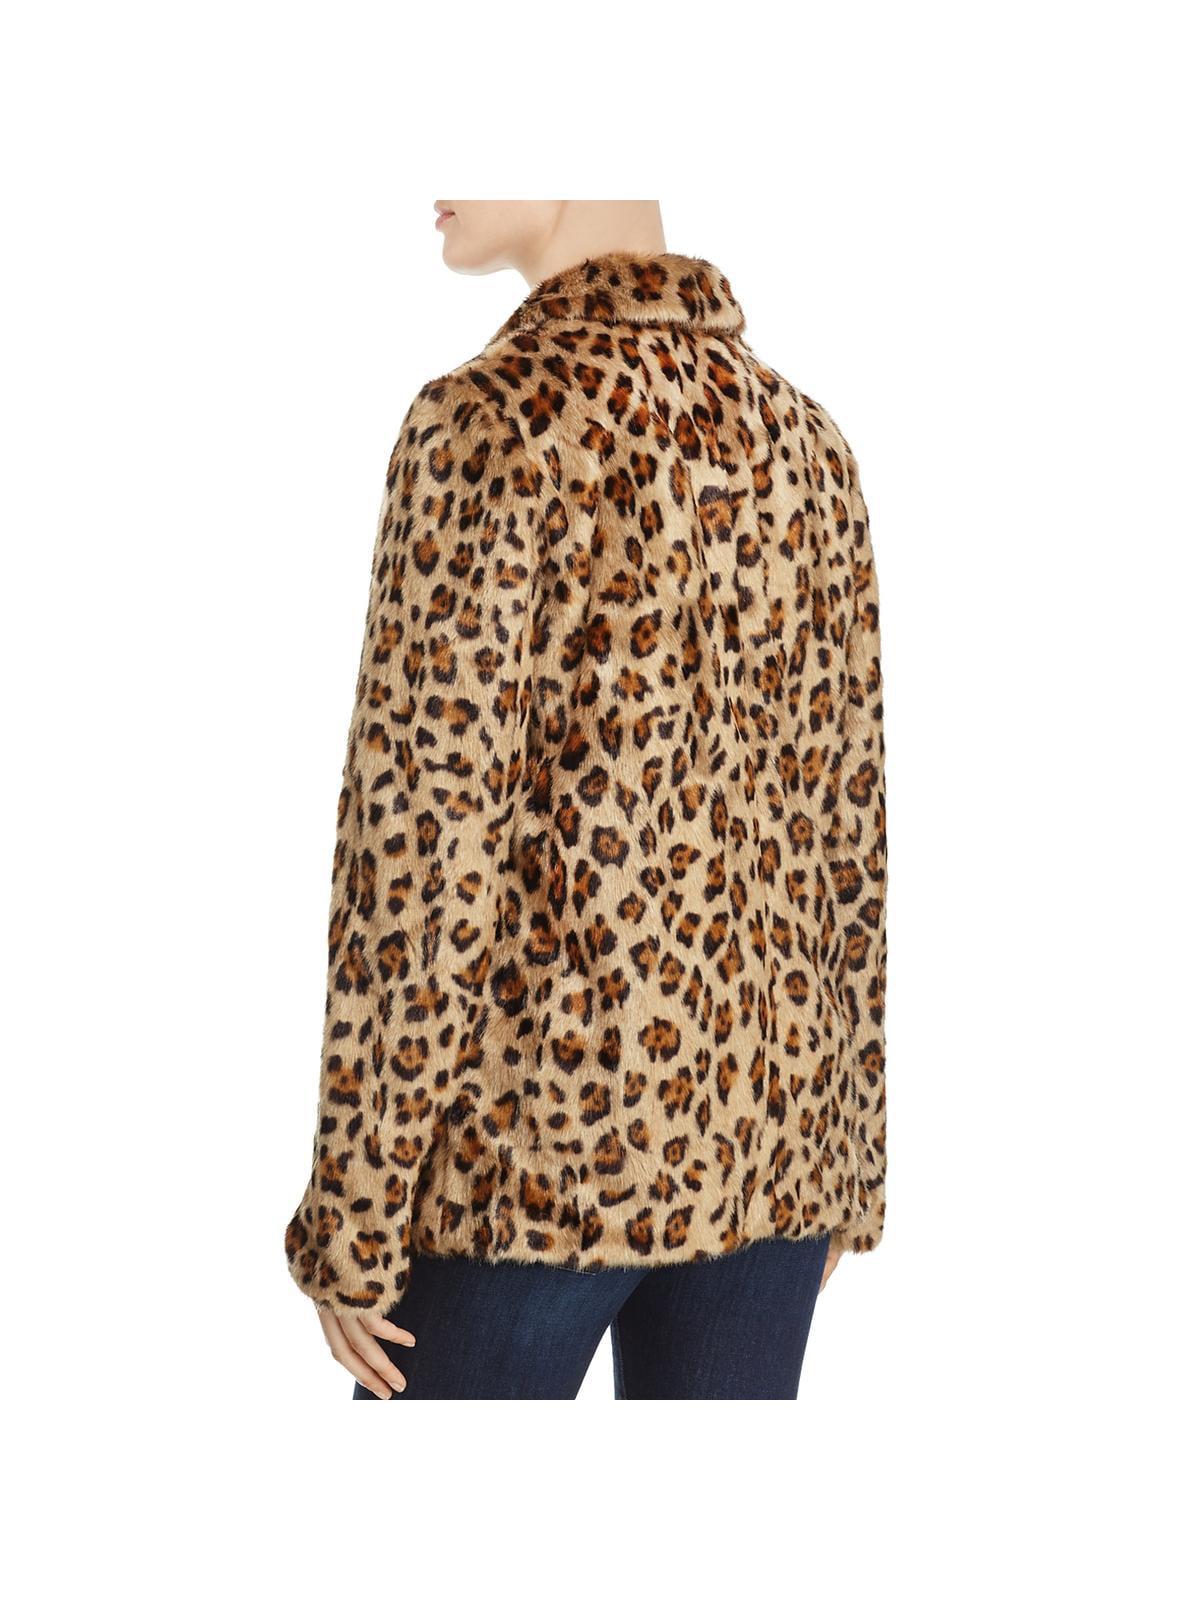 ae792f9dac5c Theory - Theory Womens Clairene Winter Leopard Print Faux Fur Coat -  Walmart.com